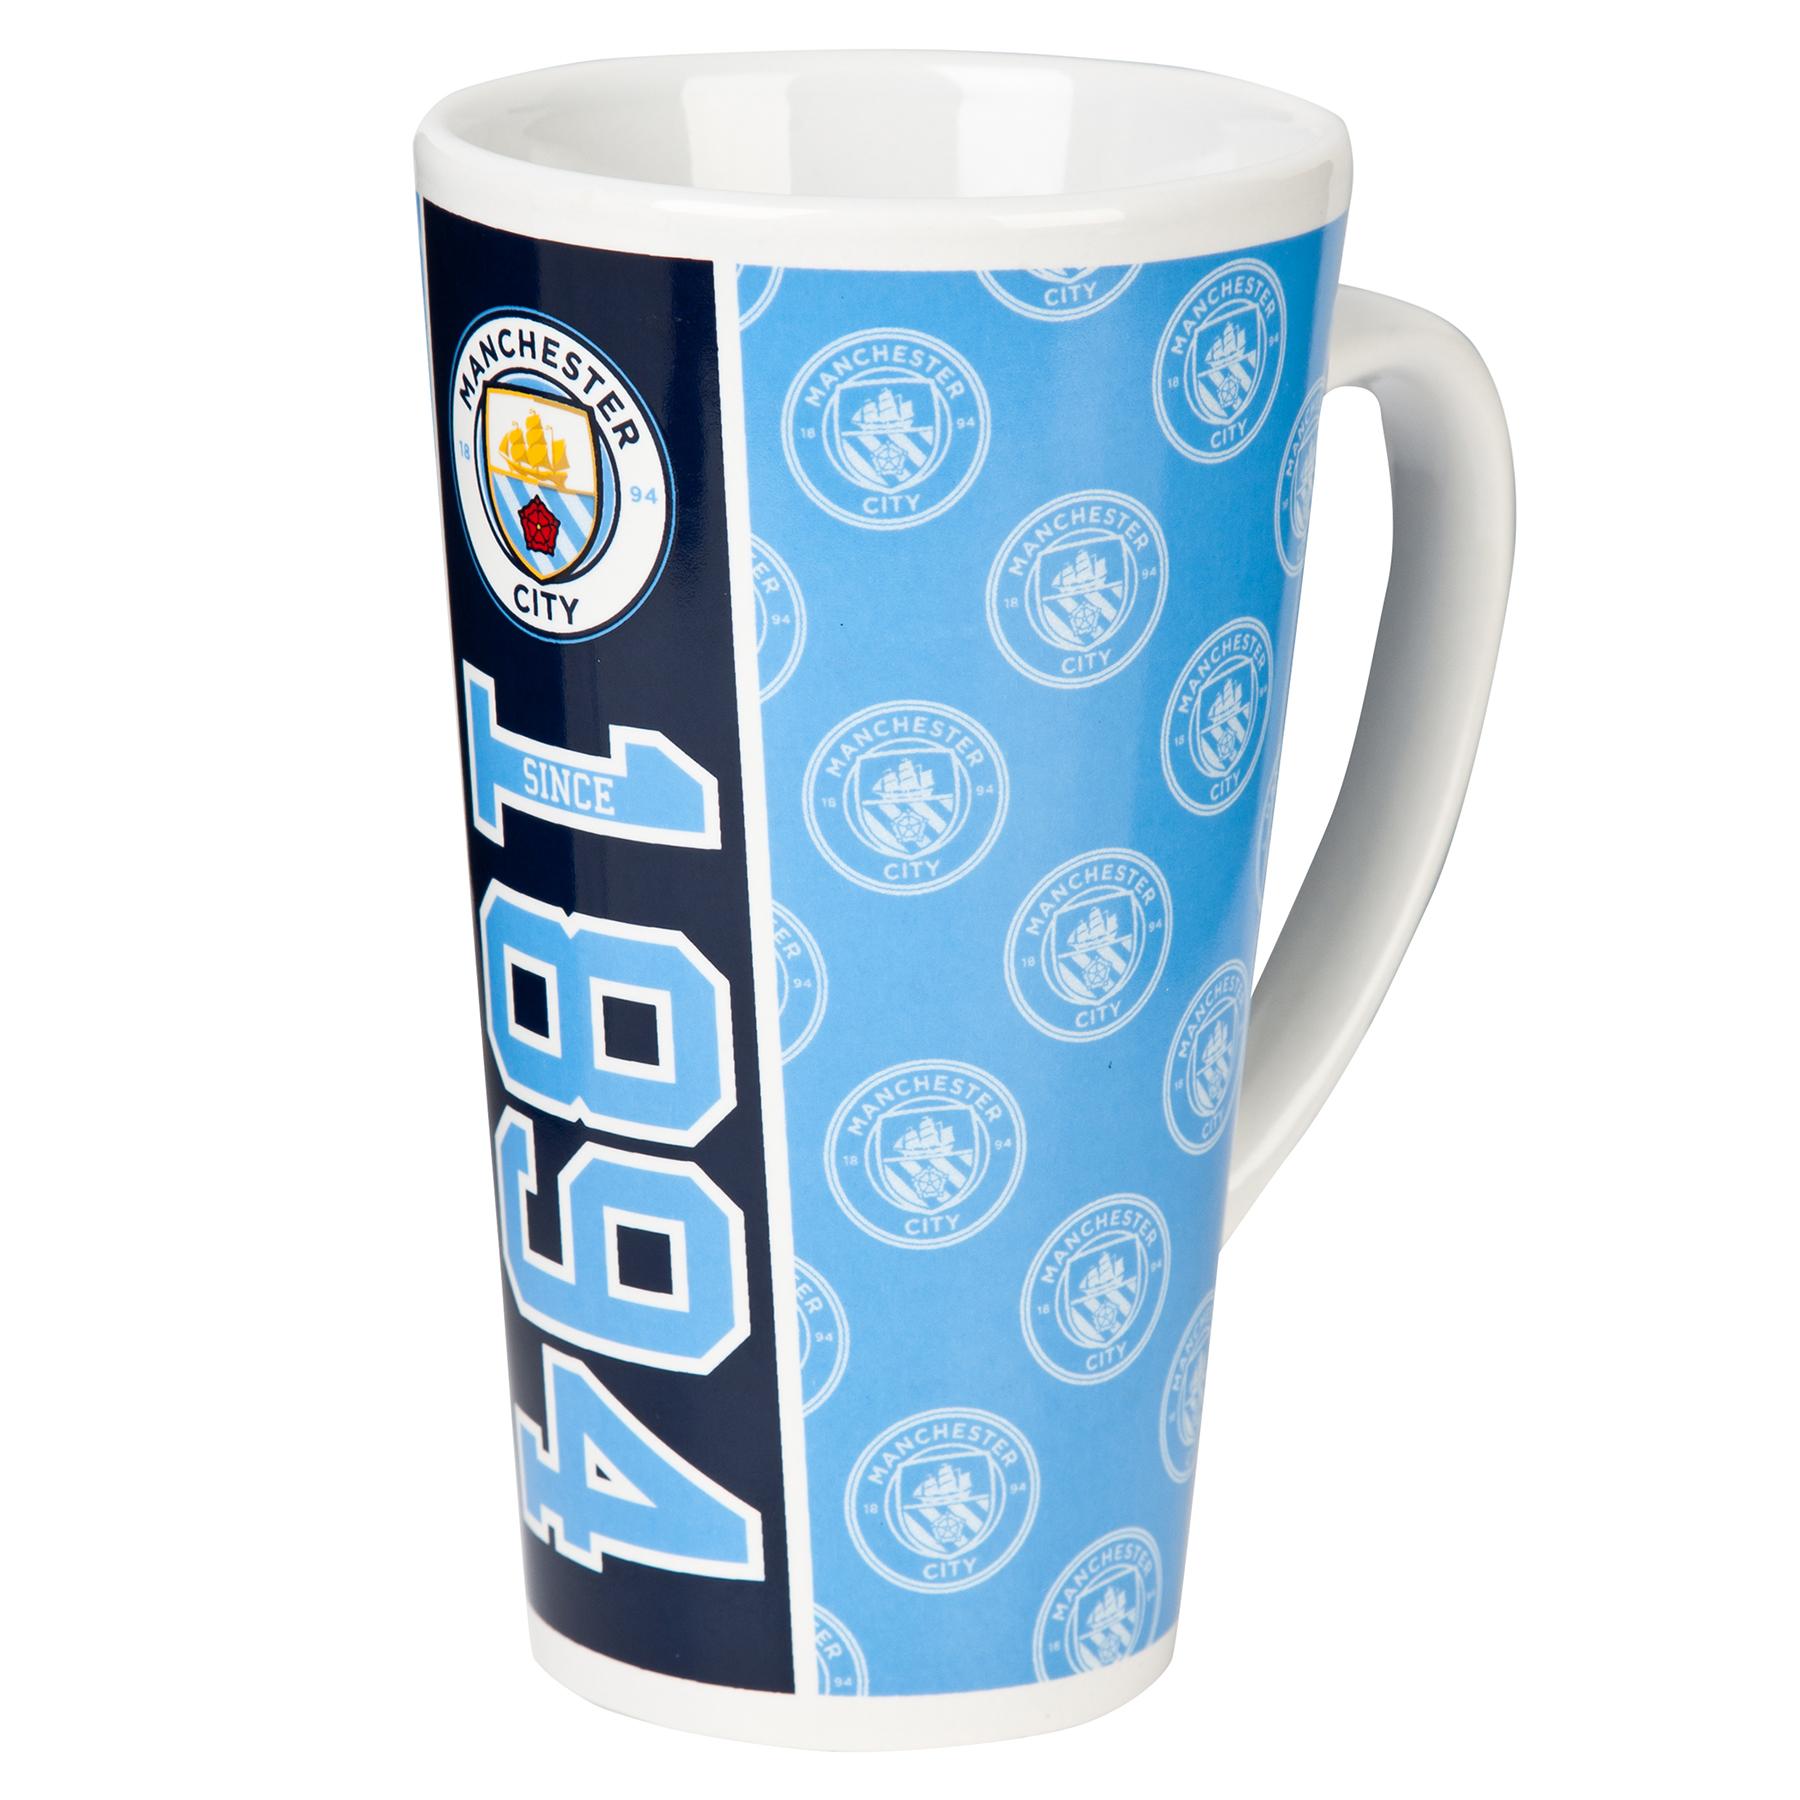 Manchester City 1894 Latte Mug